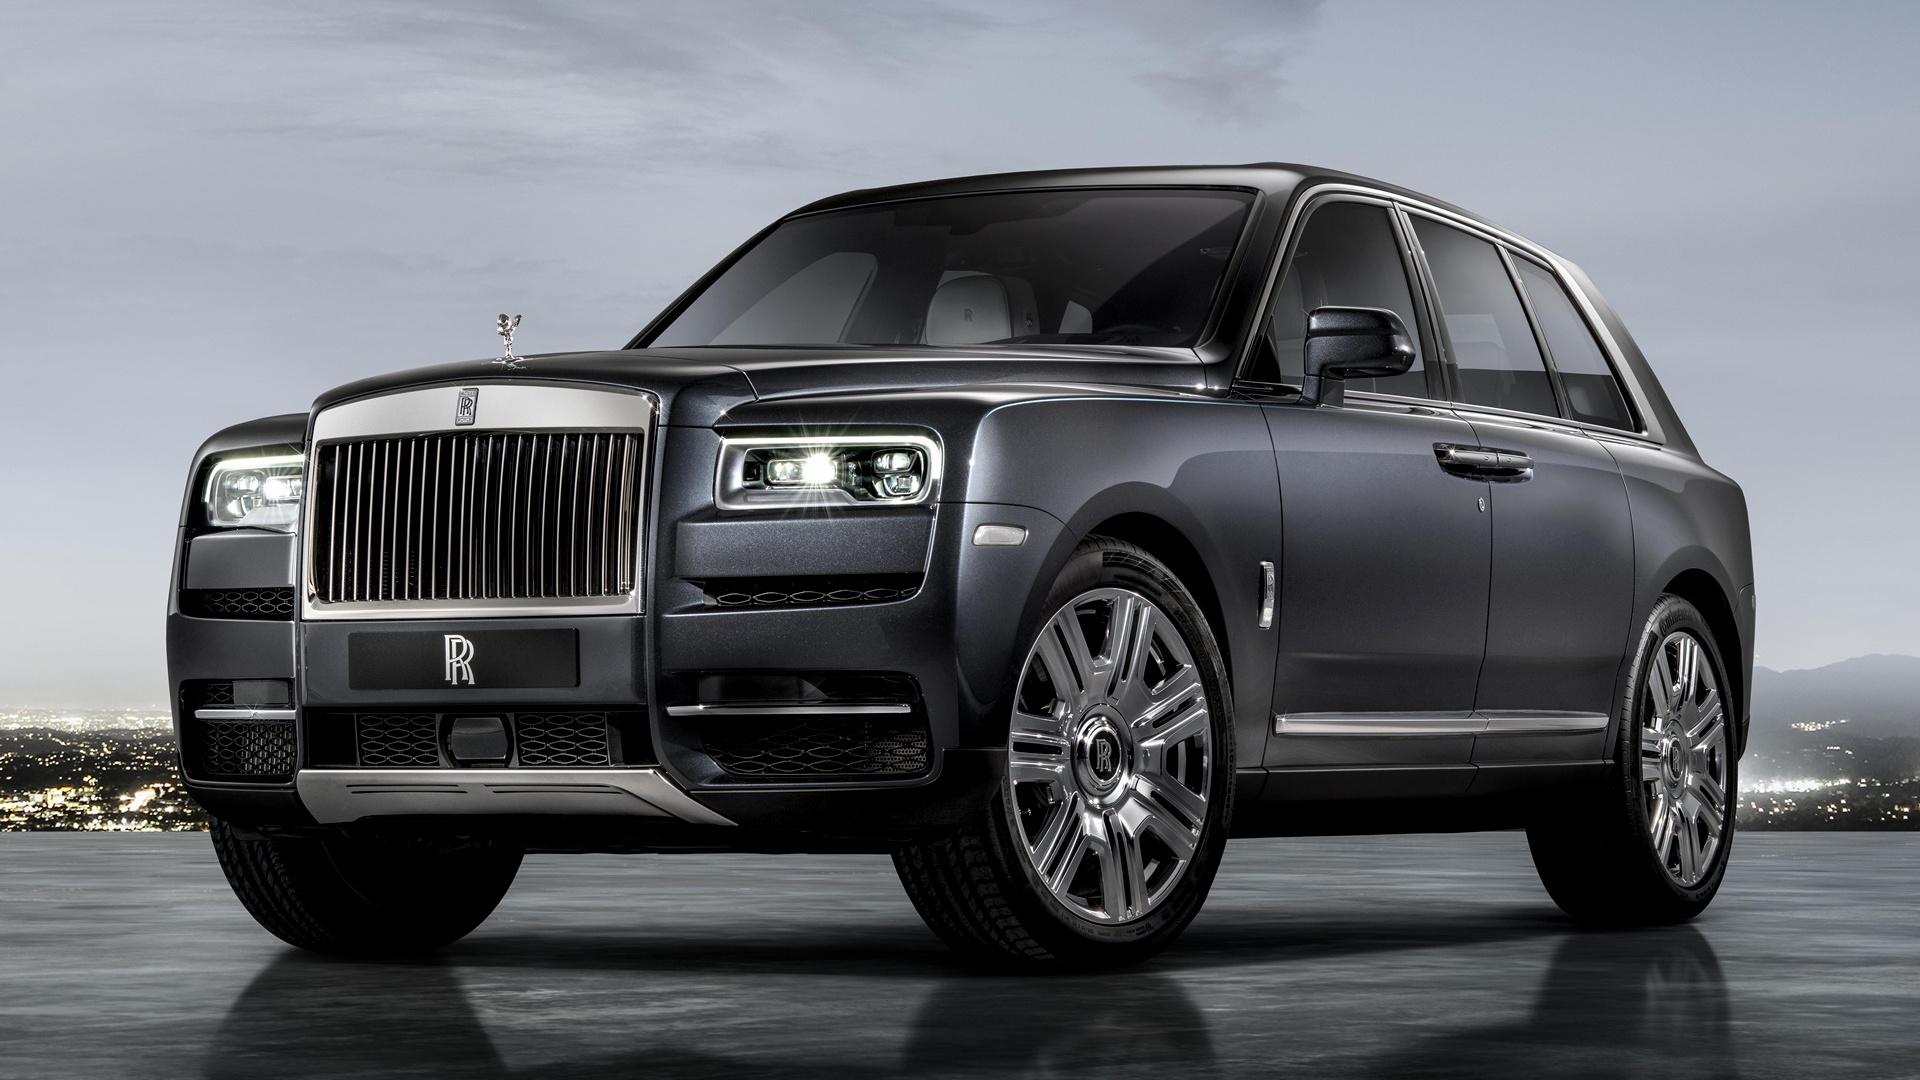 2018 Rolls Royce Cullinan Hd Wallpaper Background Image